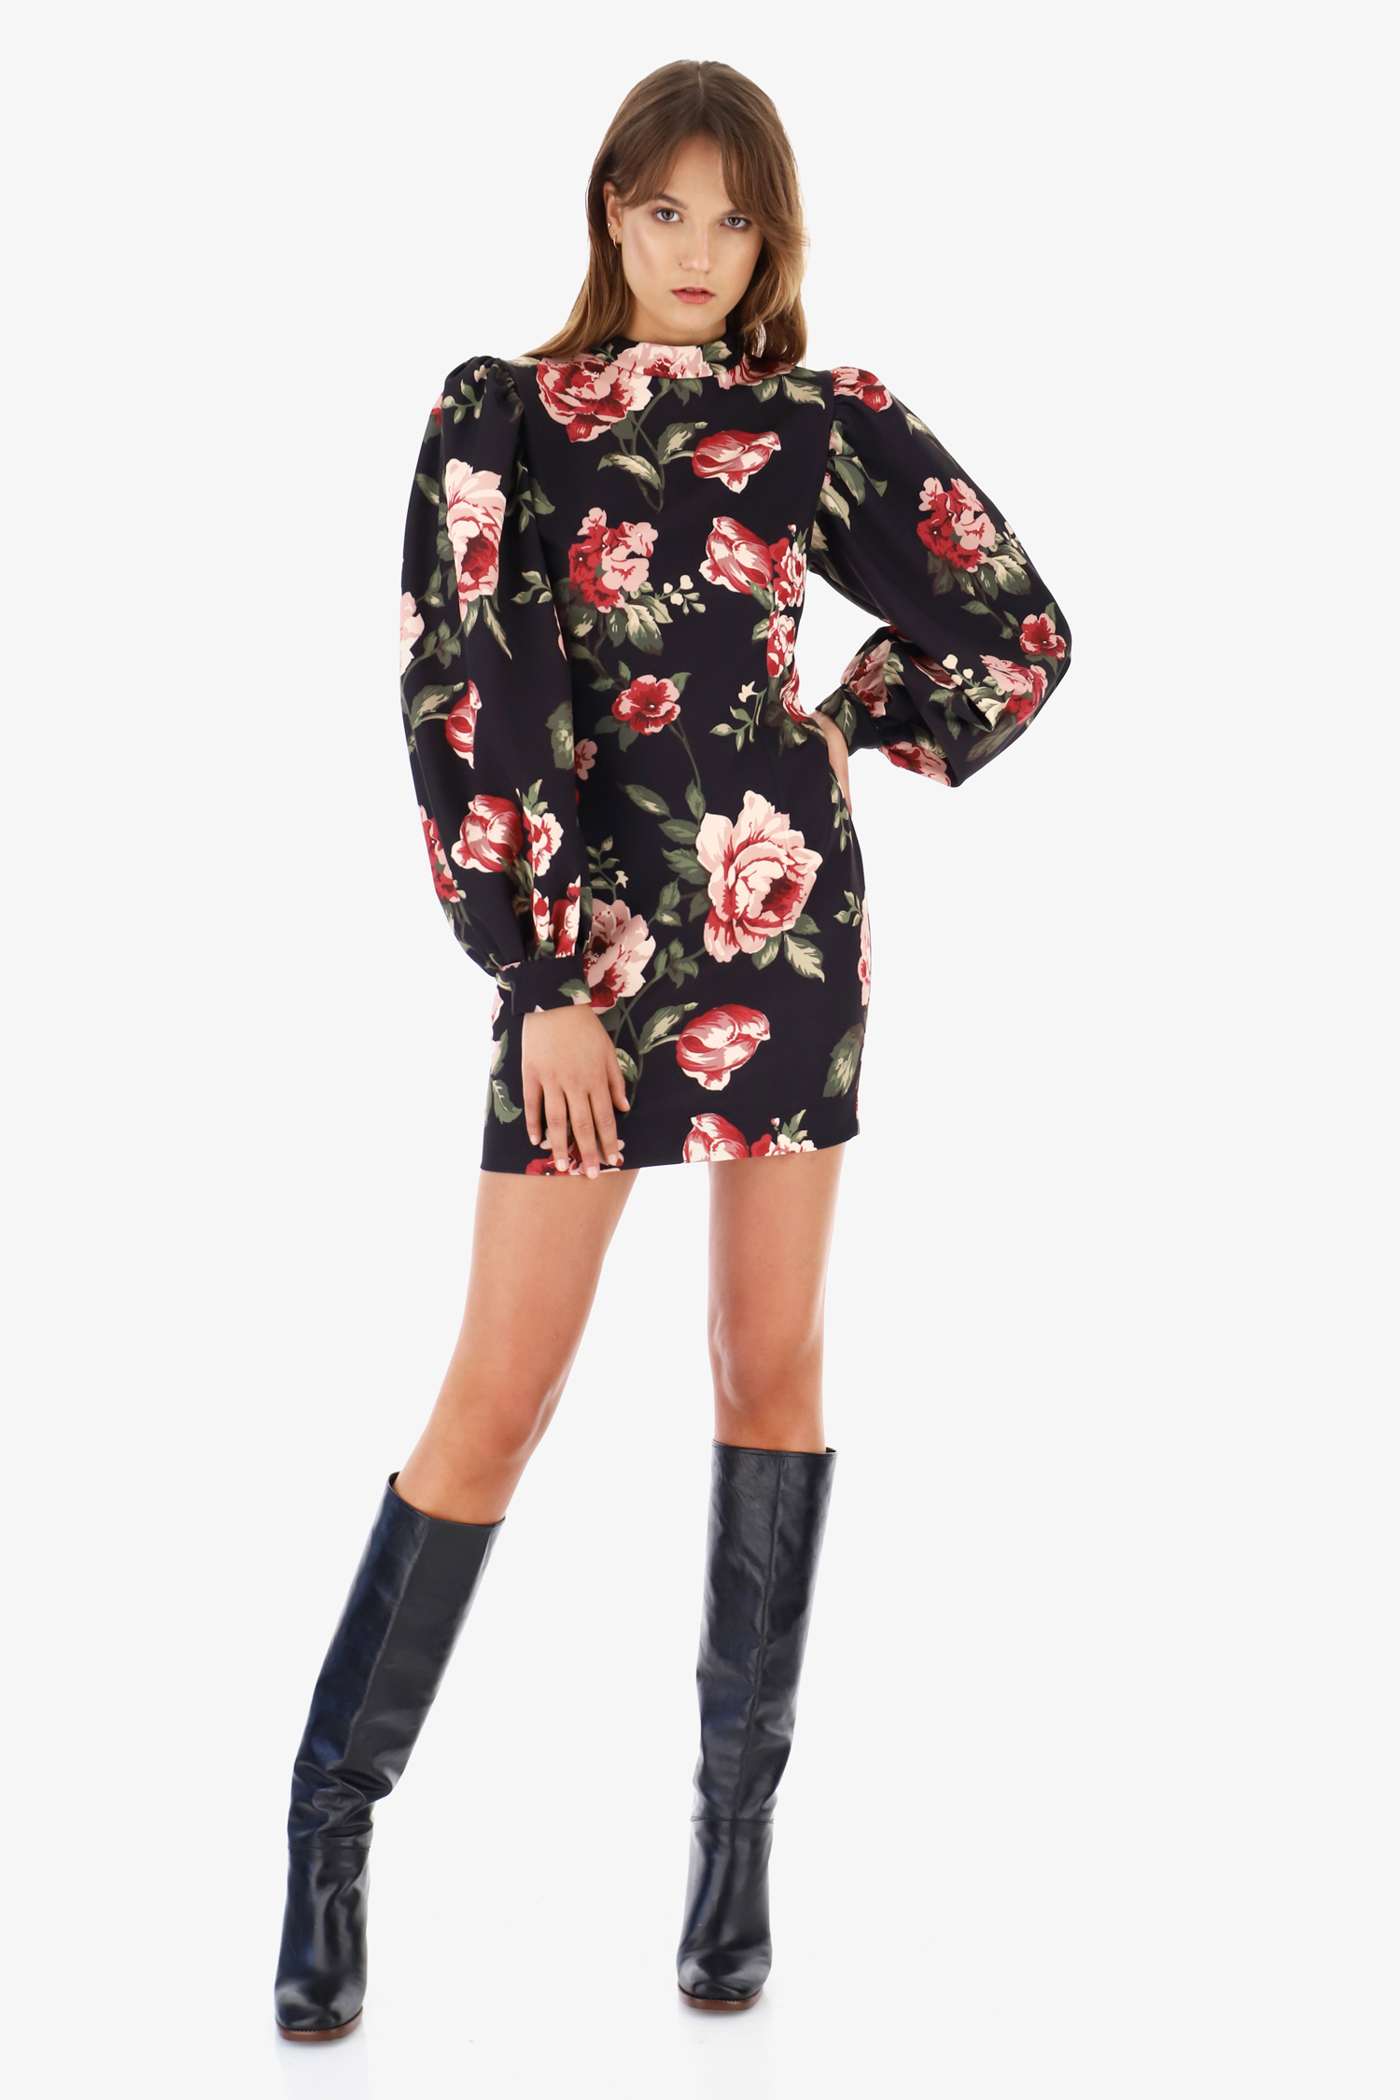 Коротка сукня з прынтом роз, италийського бренду Imperial